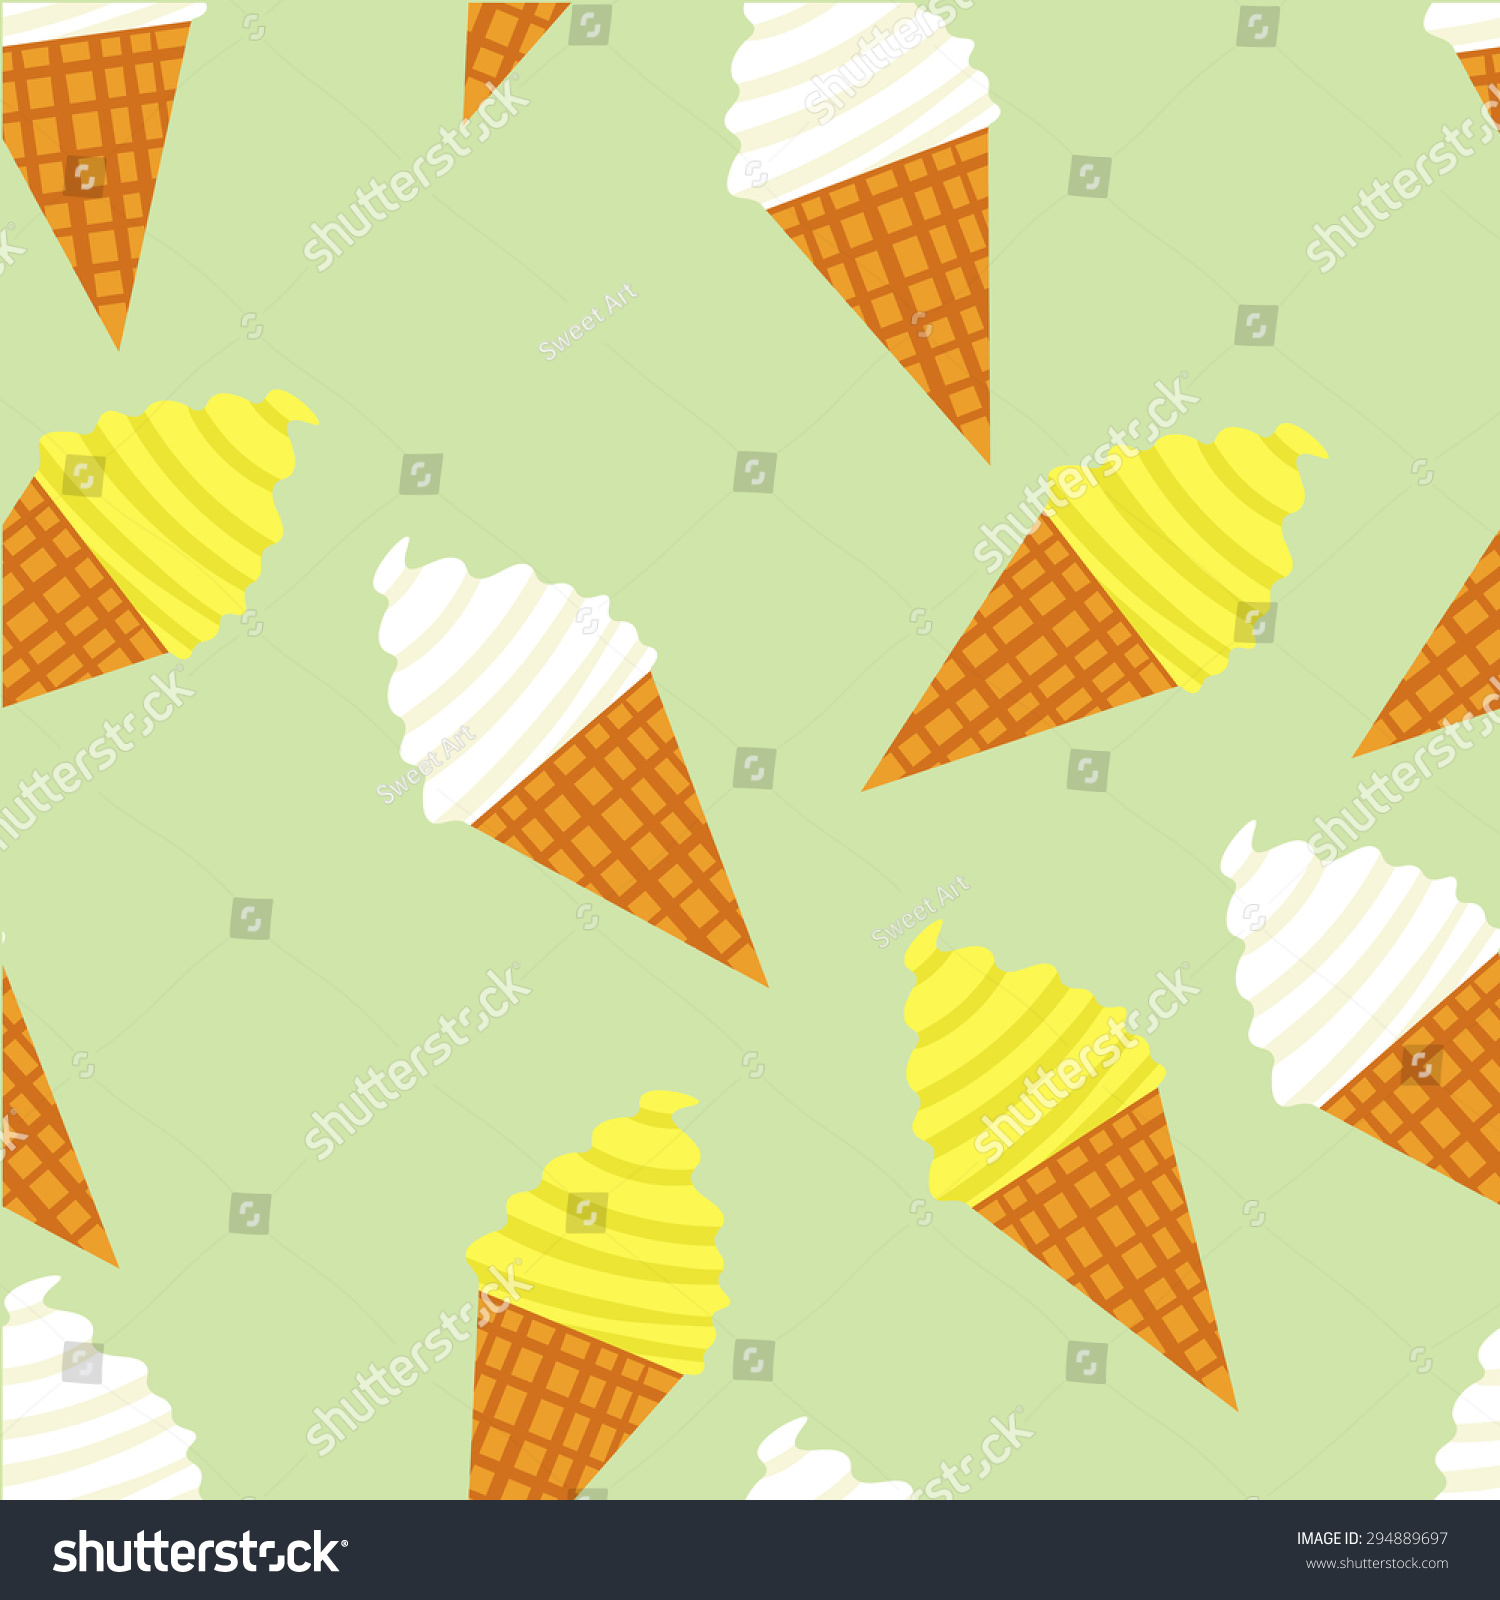 Ice Cream Cones Seamless Pattern Background Stock Vector: Seamless Vector Ice Cream Pattern Desert Stock Vector